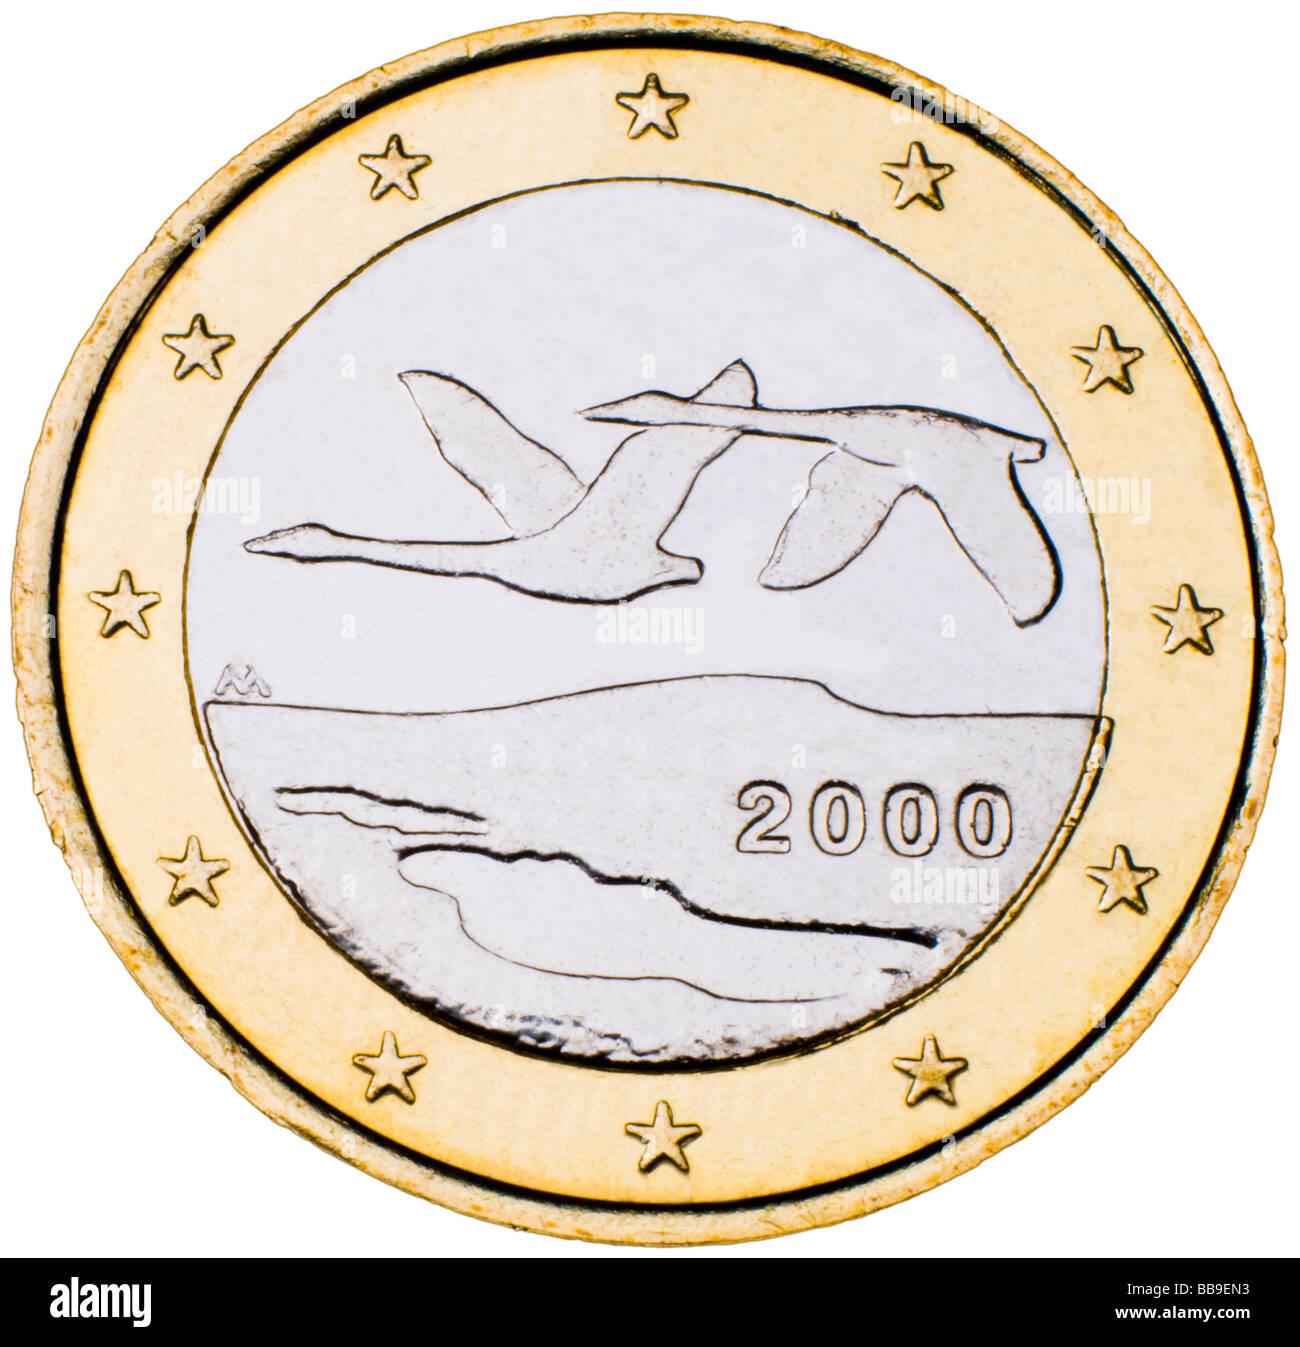 Finnland 1 Euro Münze Rückwärts Stockfoto Bild 24180719 Alamy